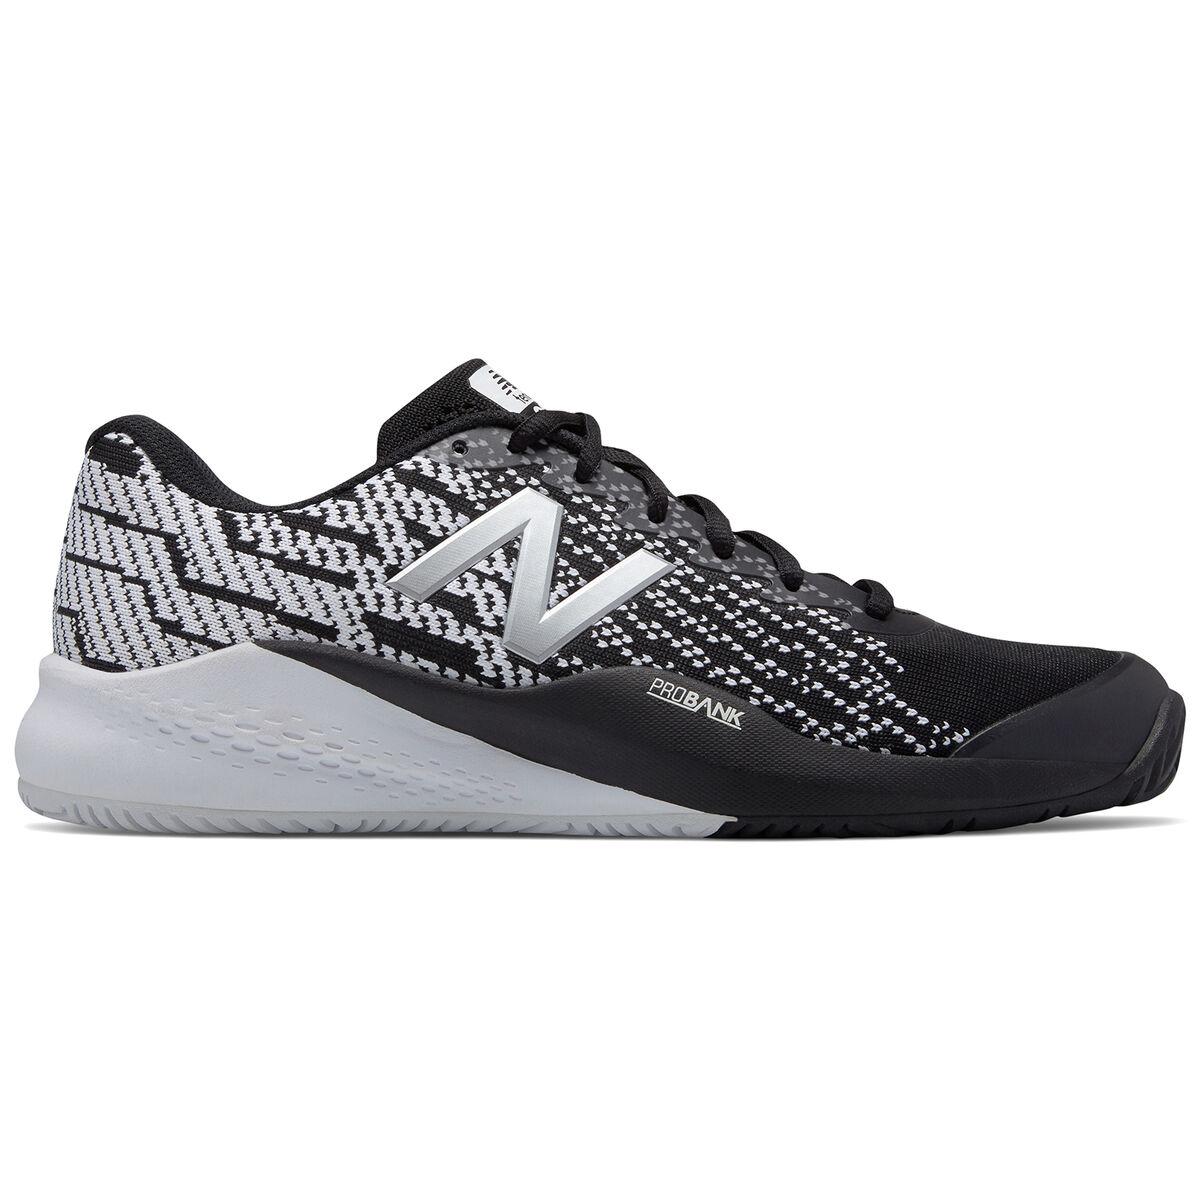 1a6d9899 New Balance 996v3 Men's Tennis Shoe - Black/White